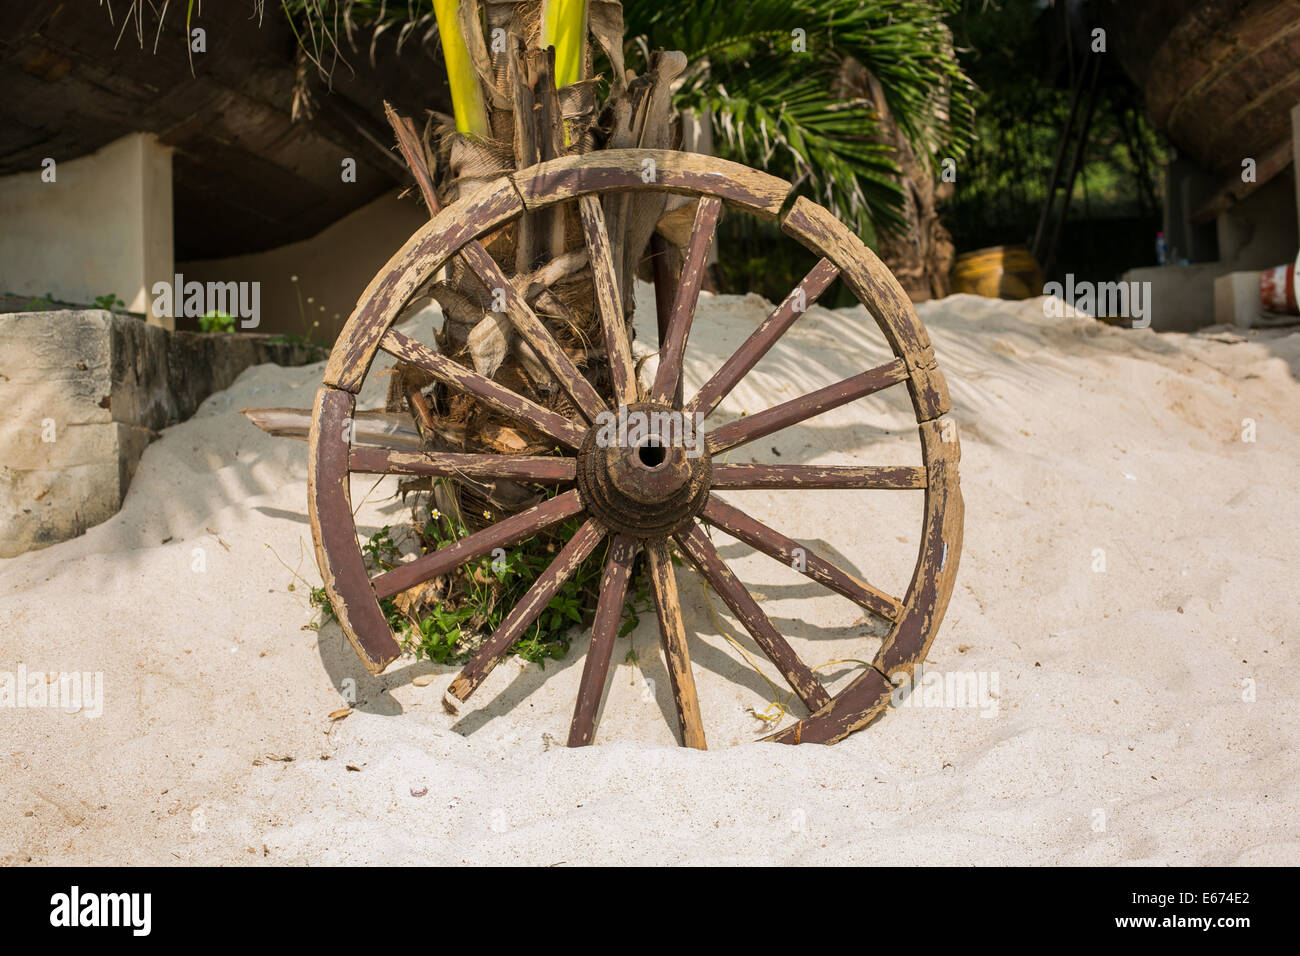 Old brown wooden wheel on sand beach. Stock Photo